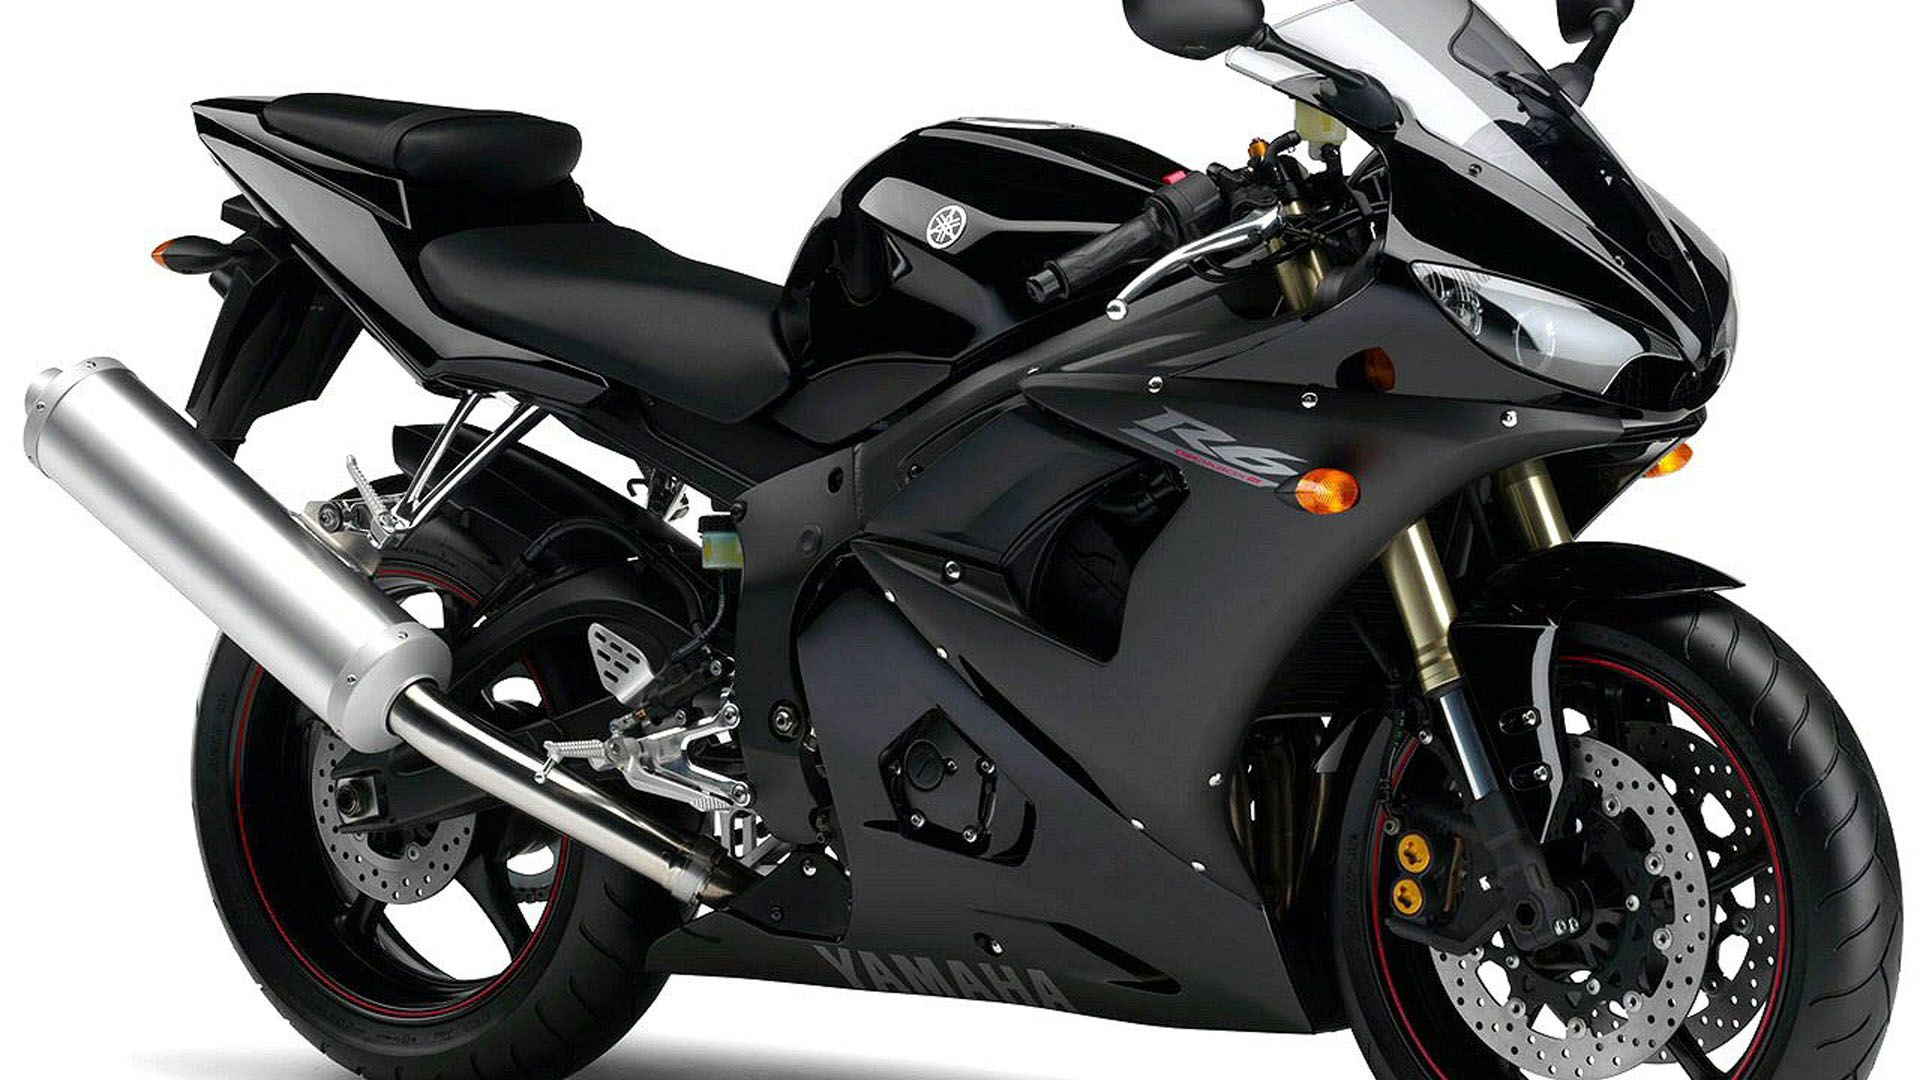 Yamaha R6 Sports Bike 1080p HD Wallpaper Sport bikes